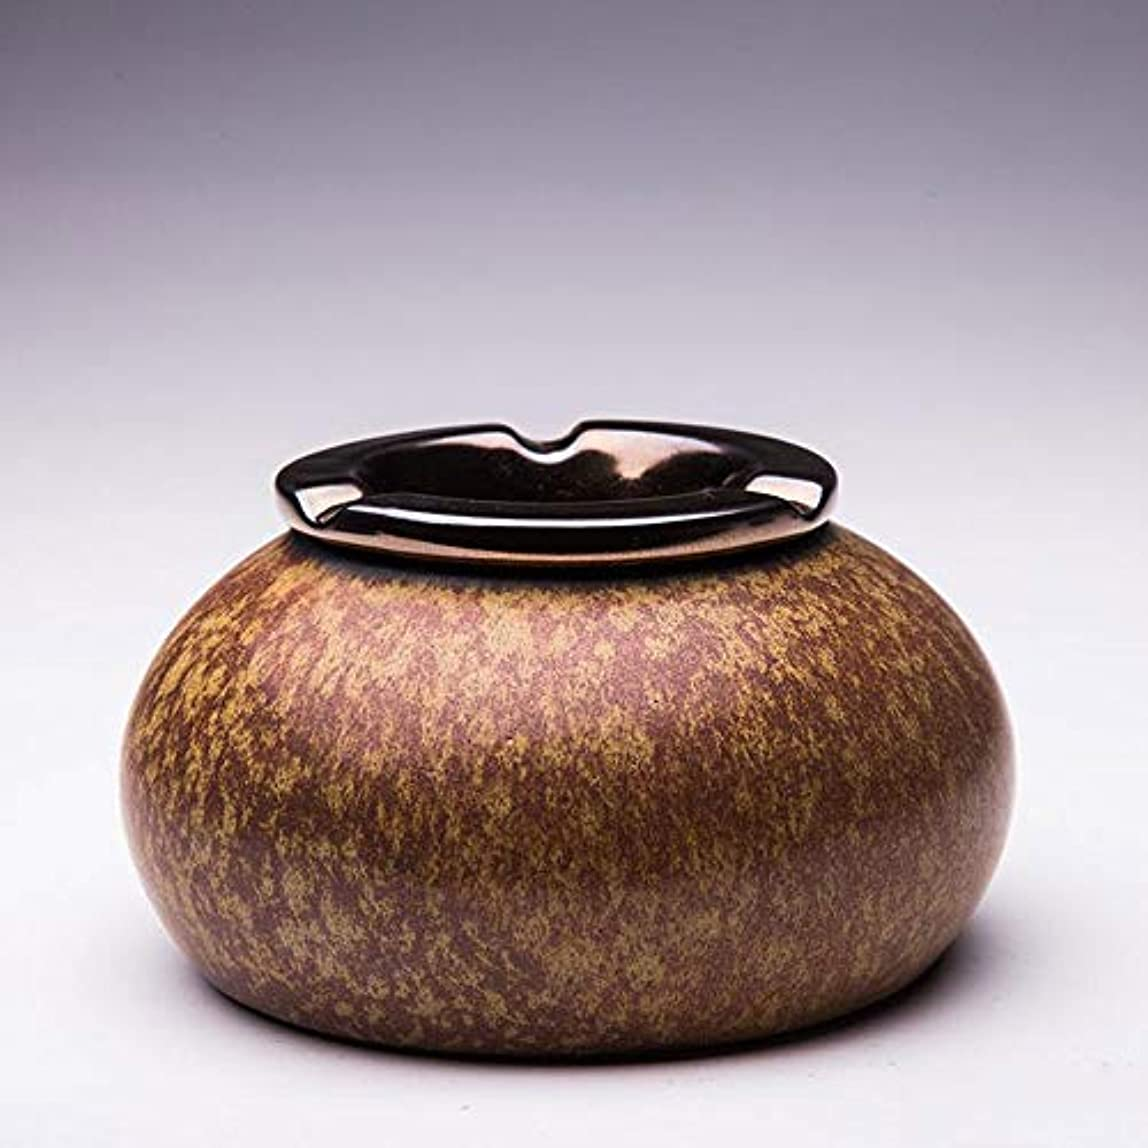 特許木材貝殻灰皿Creative Outdoor Ceramics灰皿 (色 : 褐色)